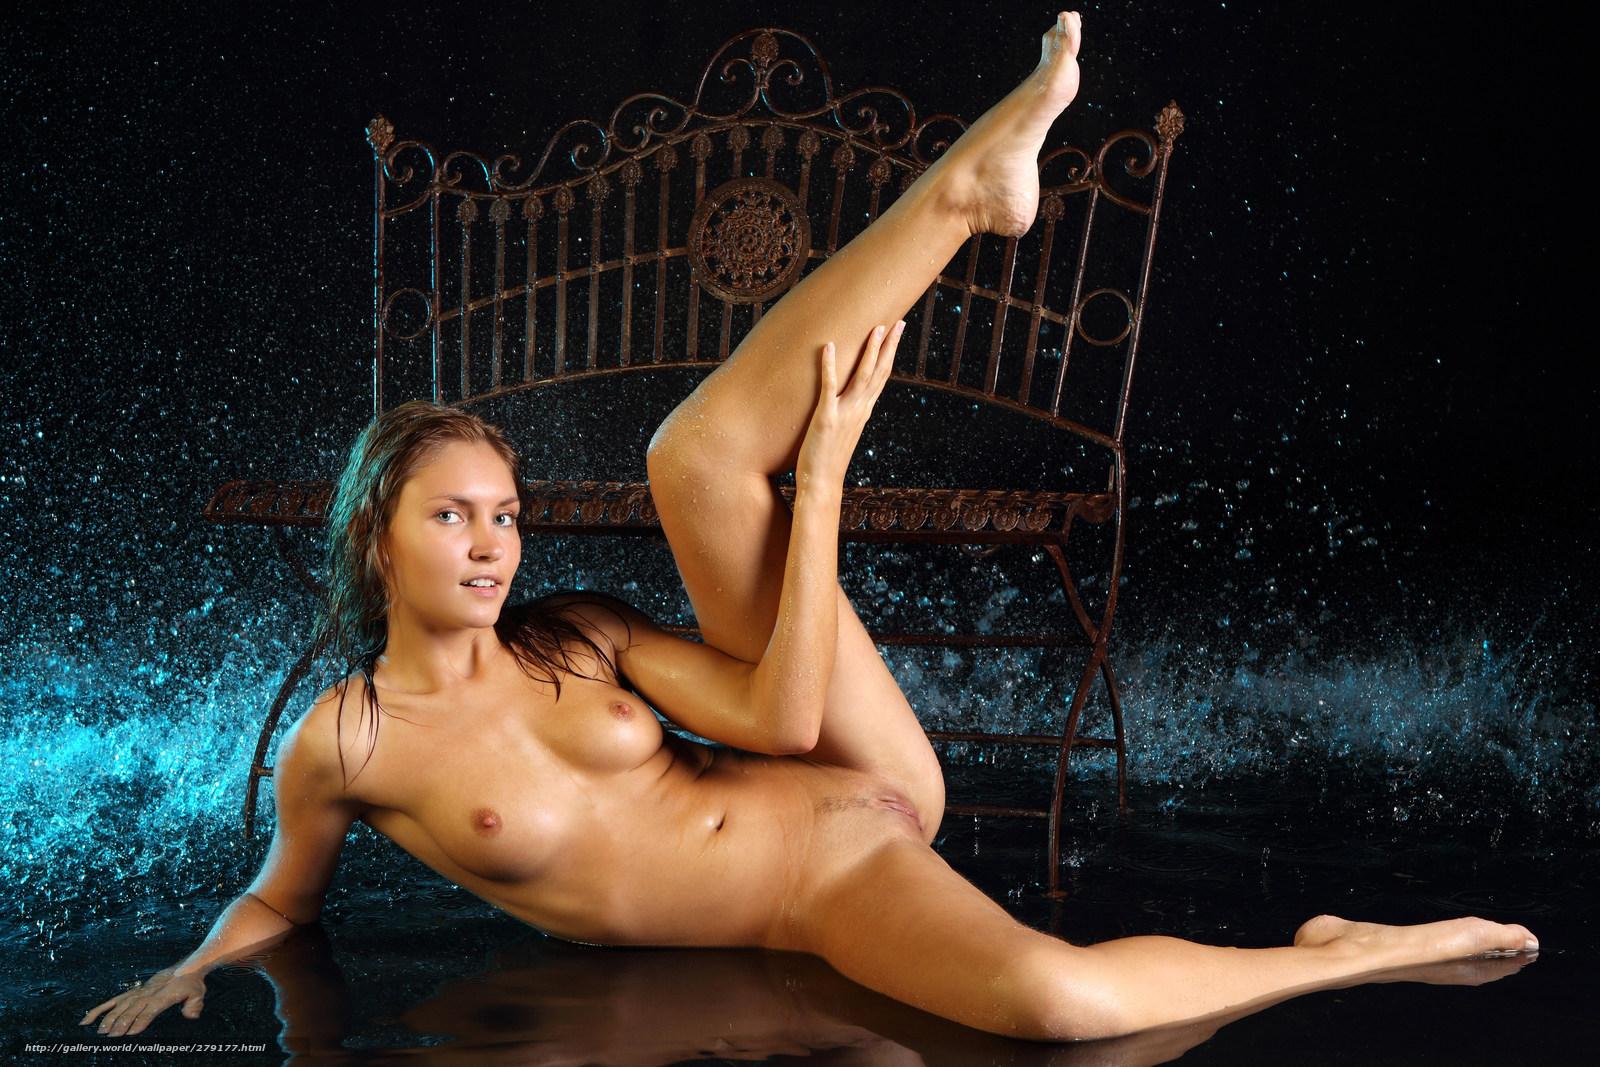 Sindori nude wallpapers naked vids